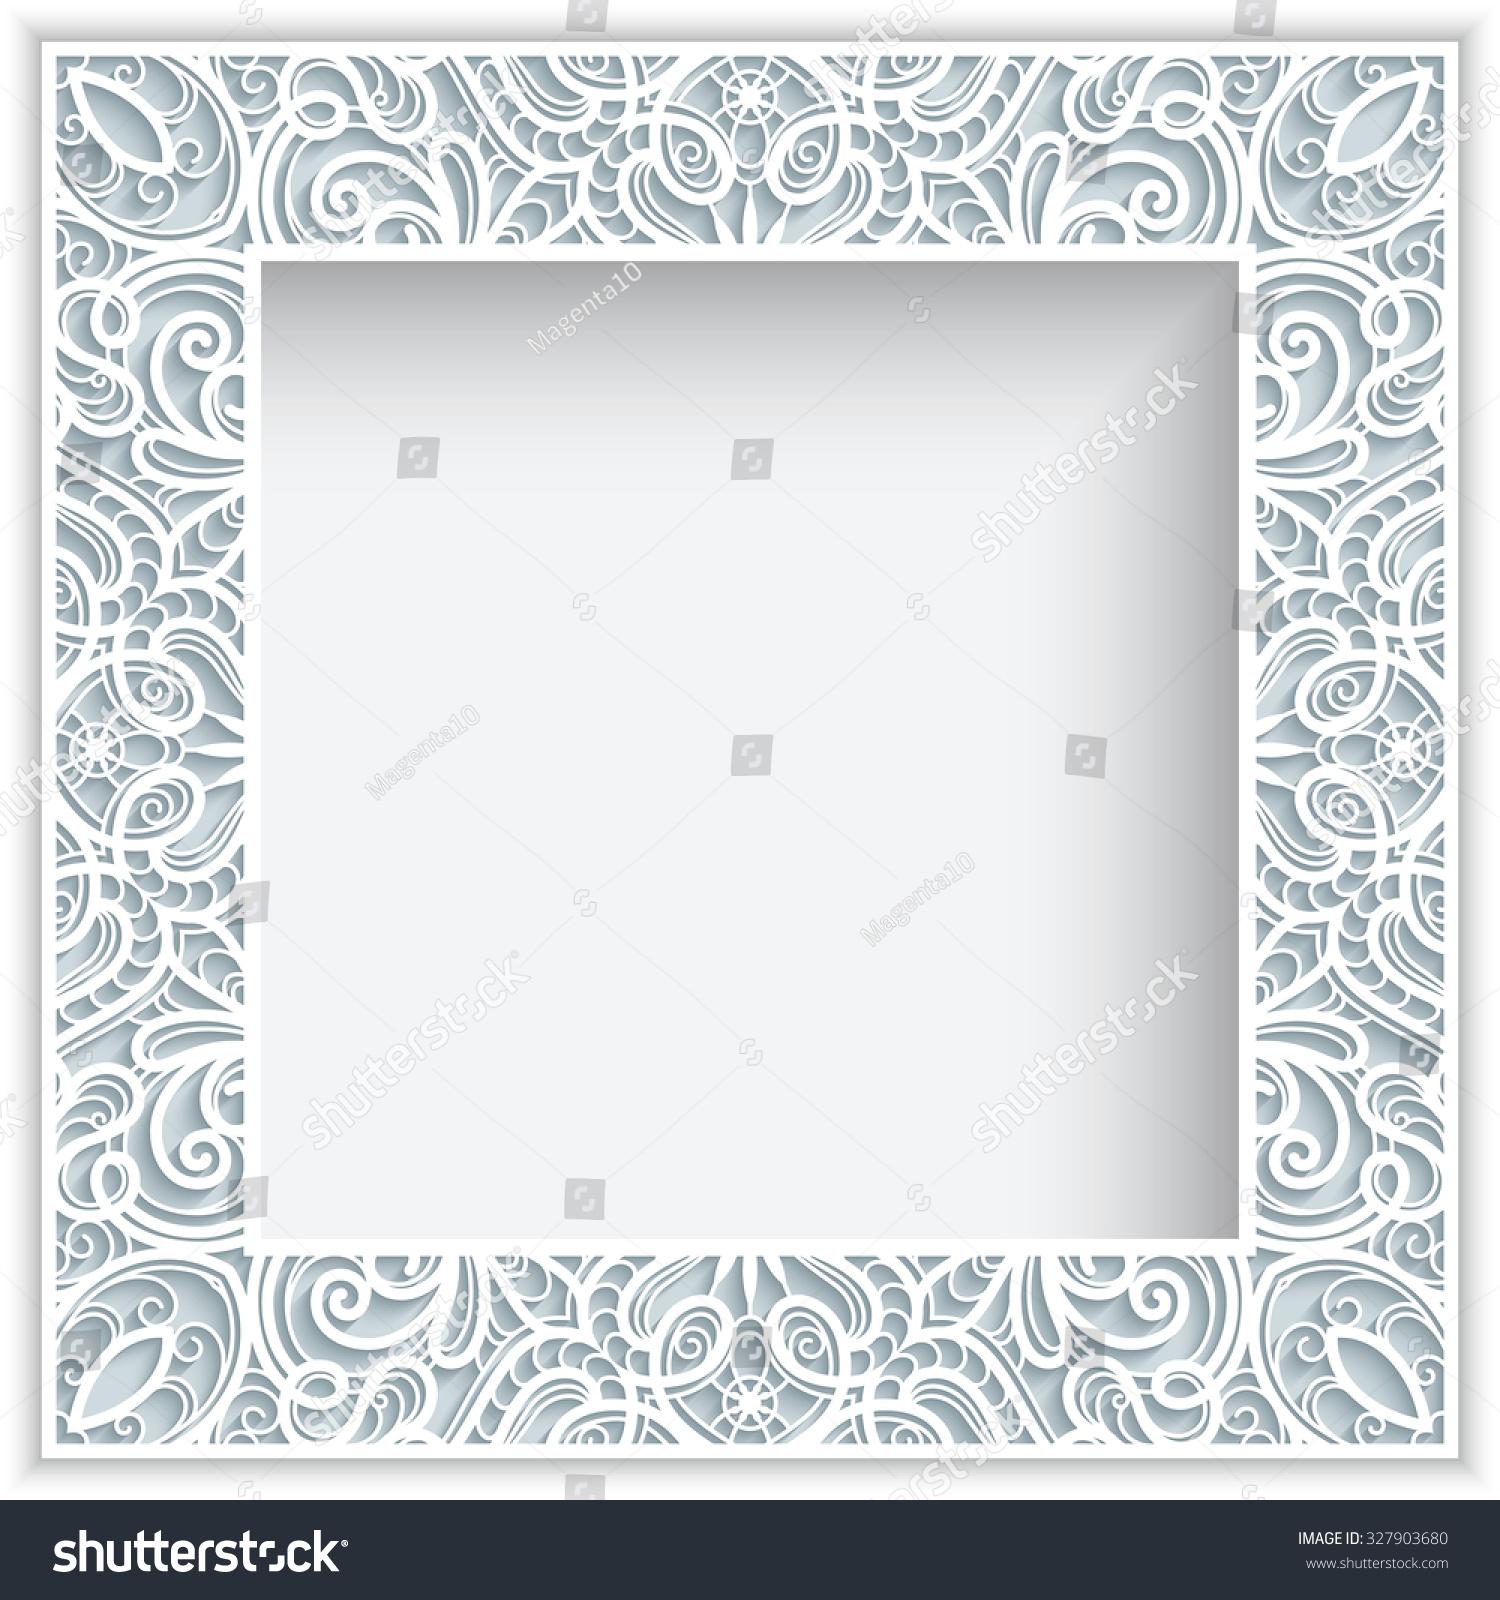 Border Paper Template Border Paper WritingPaper Border Templates – Border Paper Template